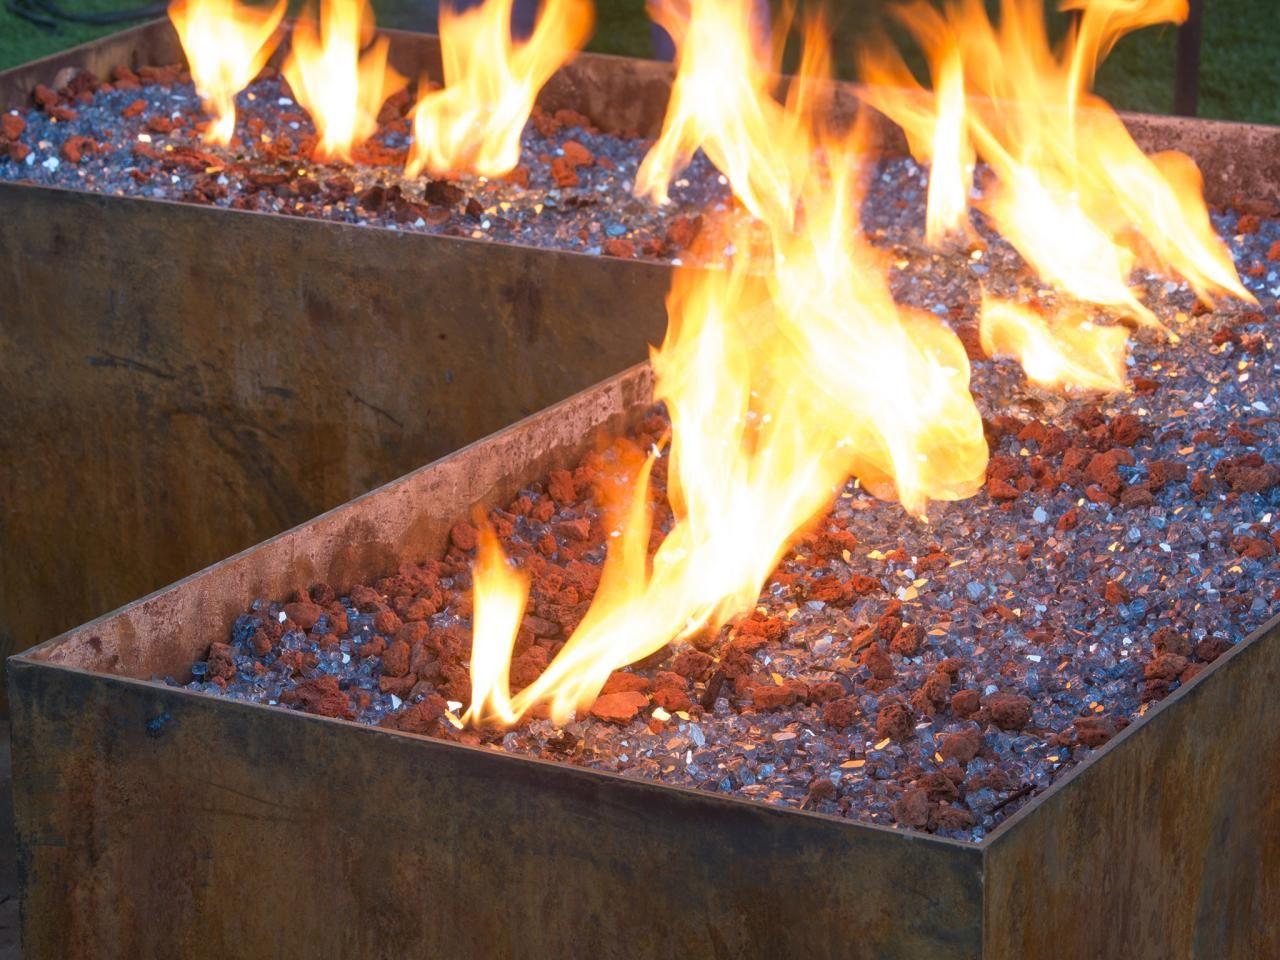 Garden fire features  Eight Backyard Makeovers from DIY Networkus Yard Crashers  Fire